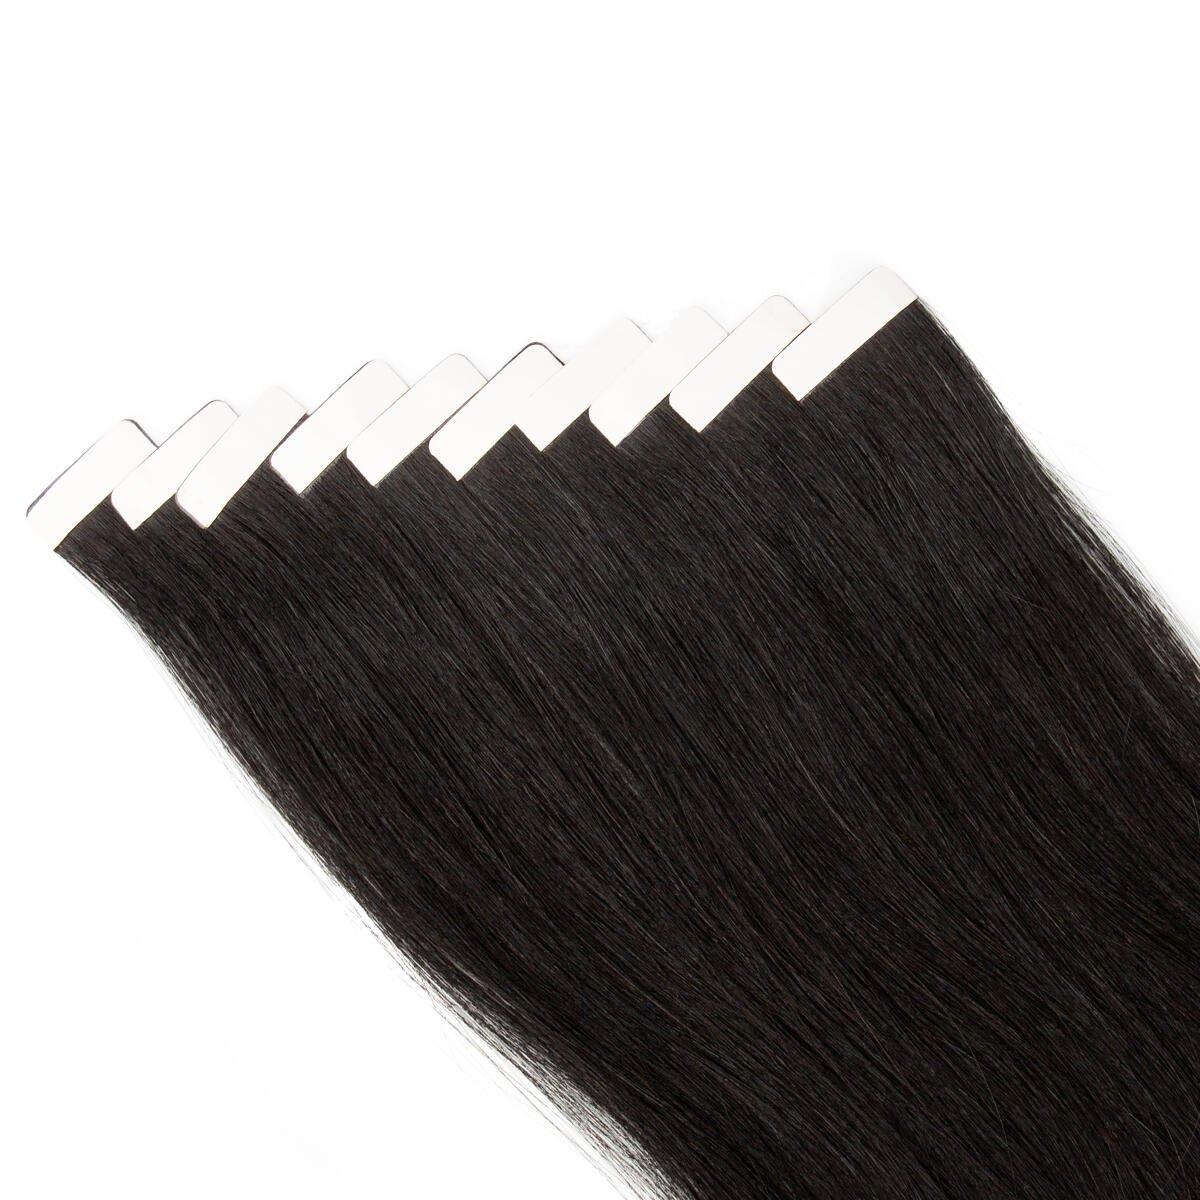 Sleek Tape Extension Premium 1.0 Black 25 cm